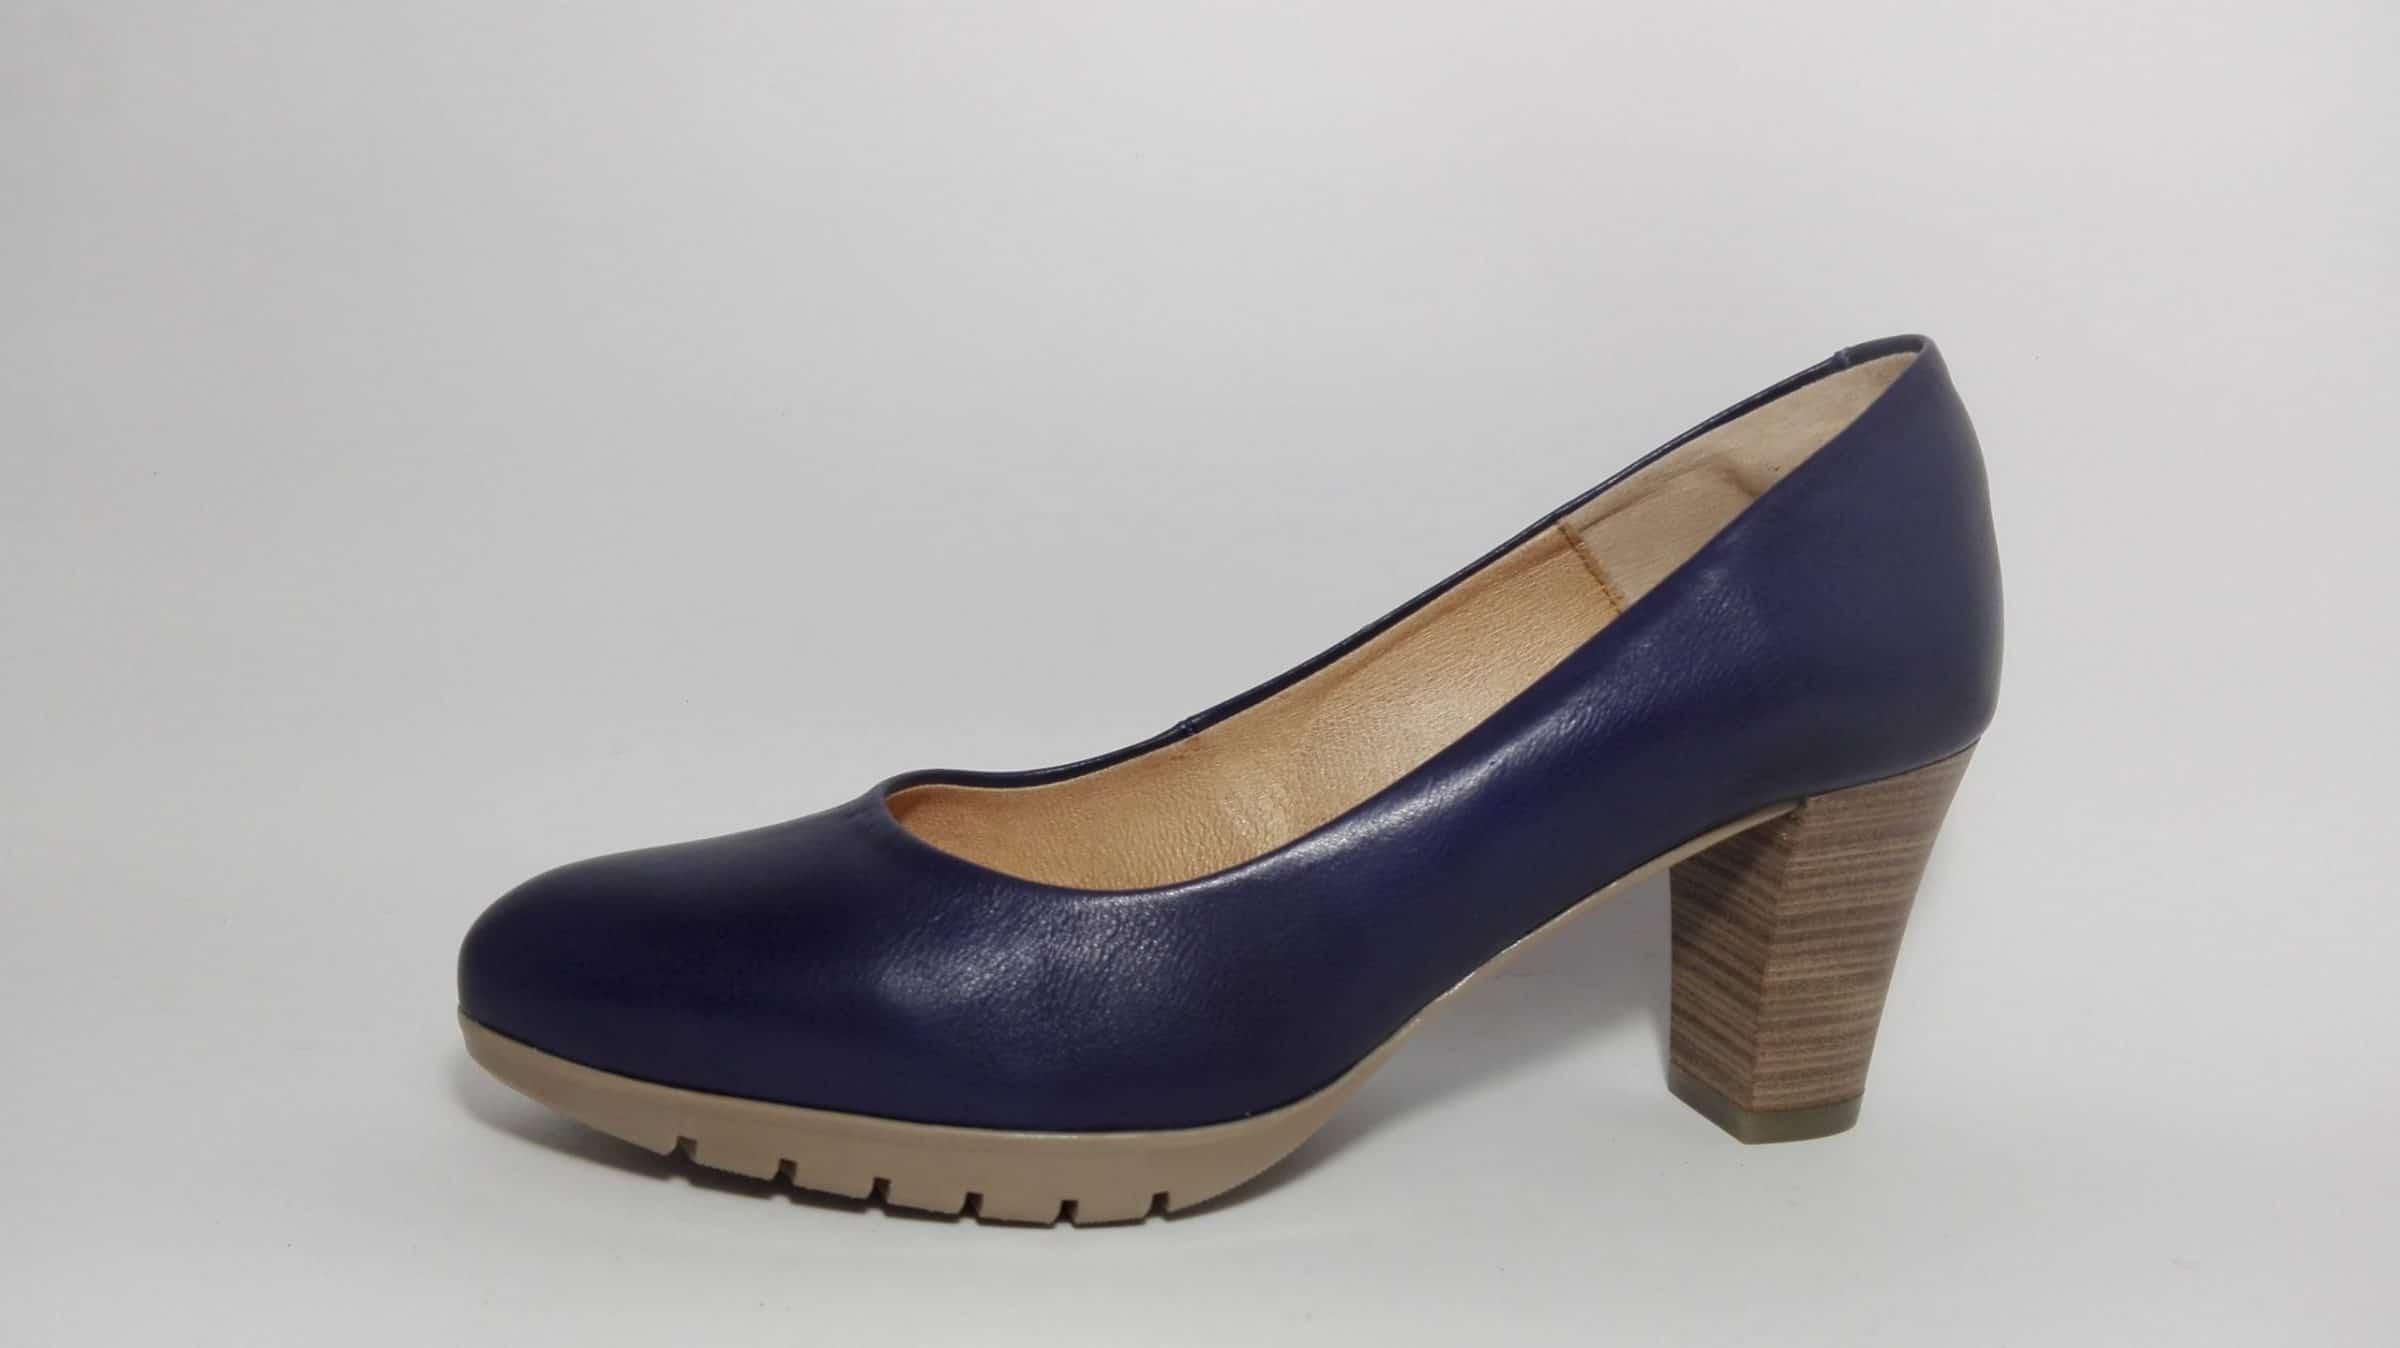 Zapato de salón con planta de gel azul- Mod. 2220 Desiree